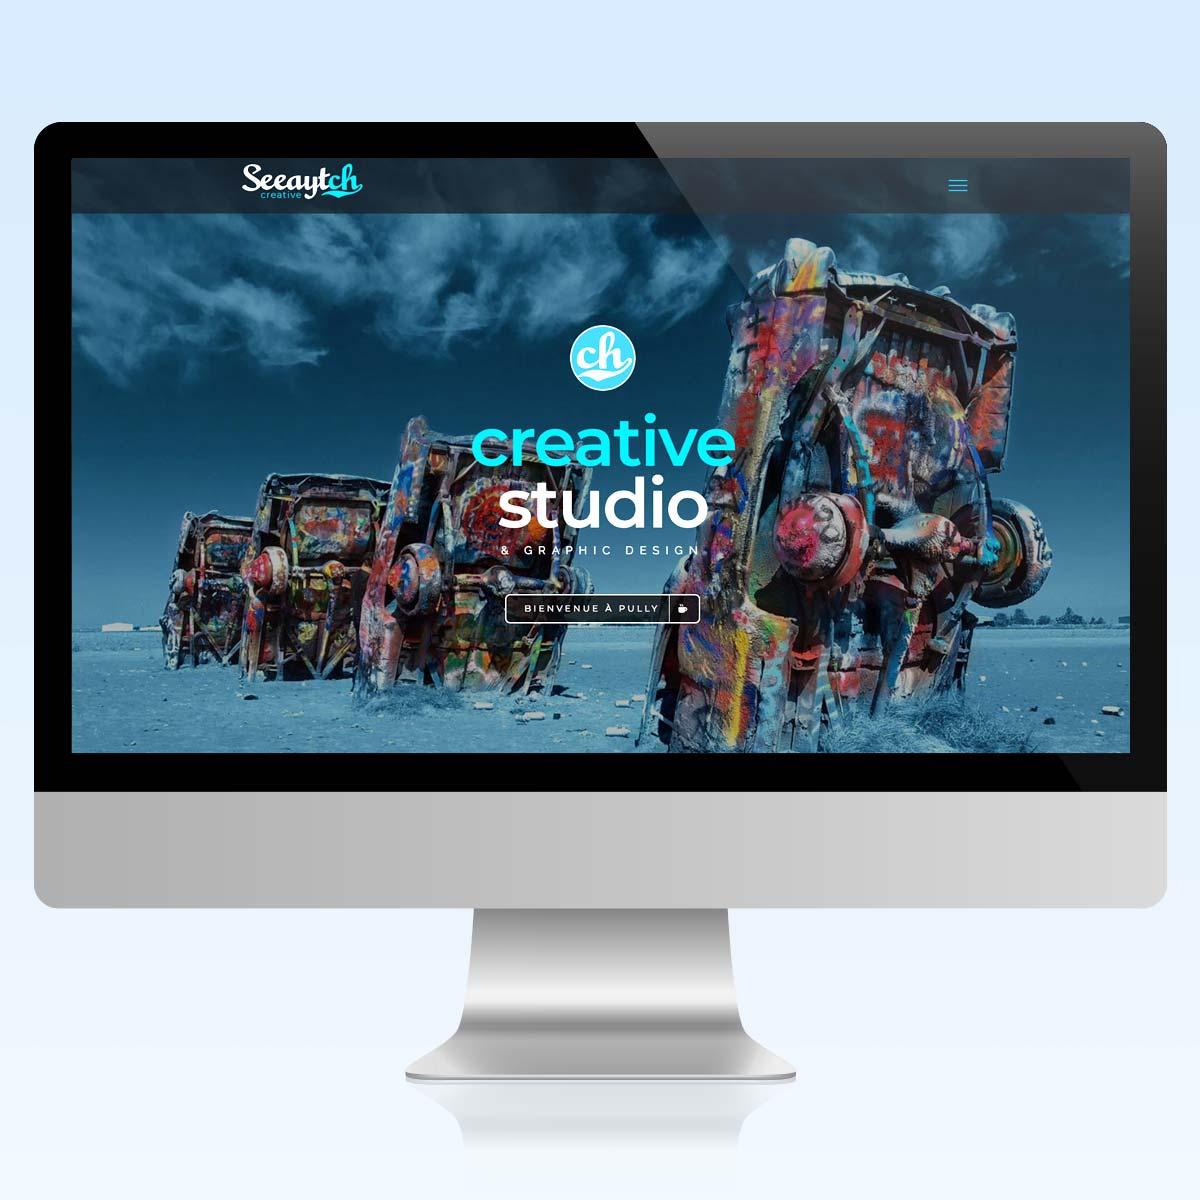 creation de sites internet, Vevey, Pully, Lausanne - Seeaytch Creative